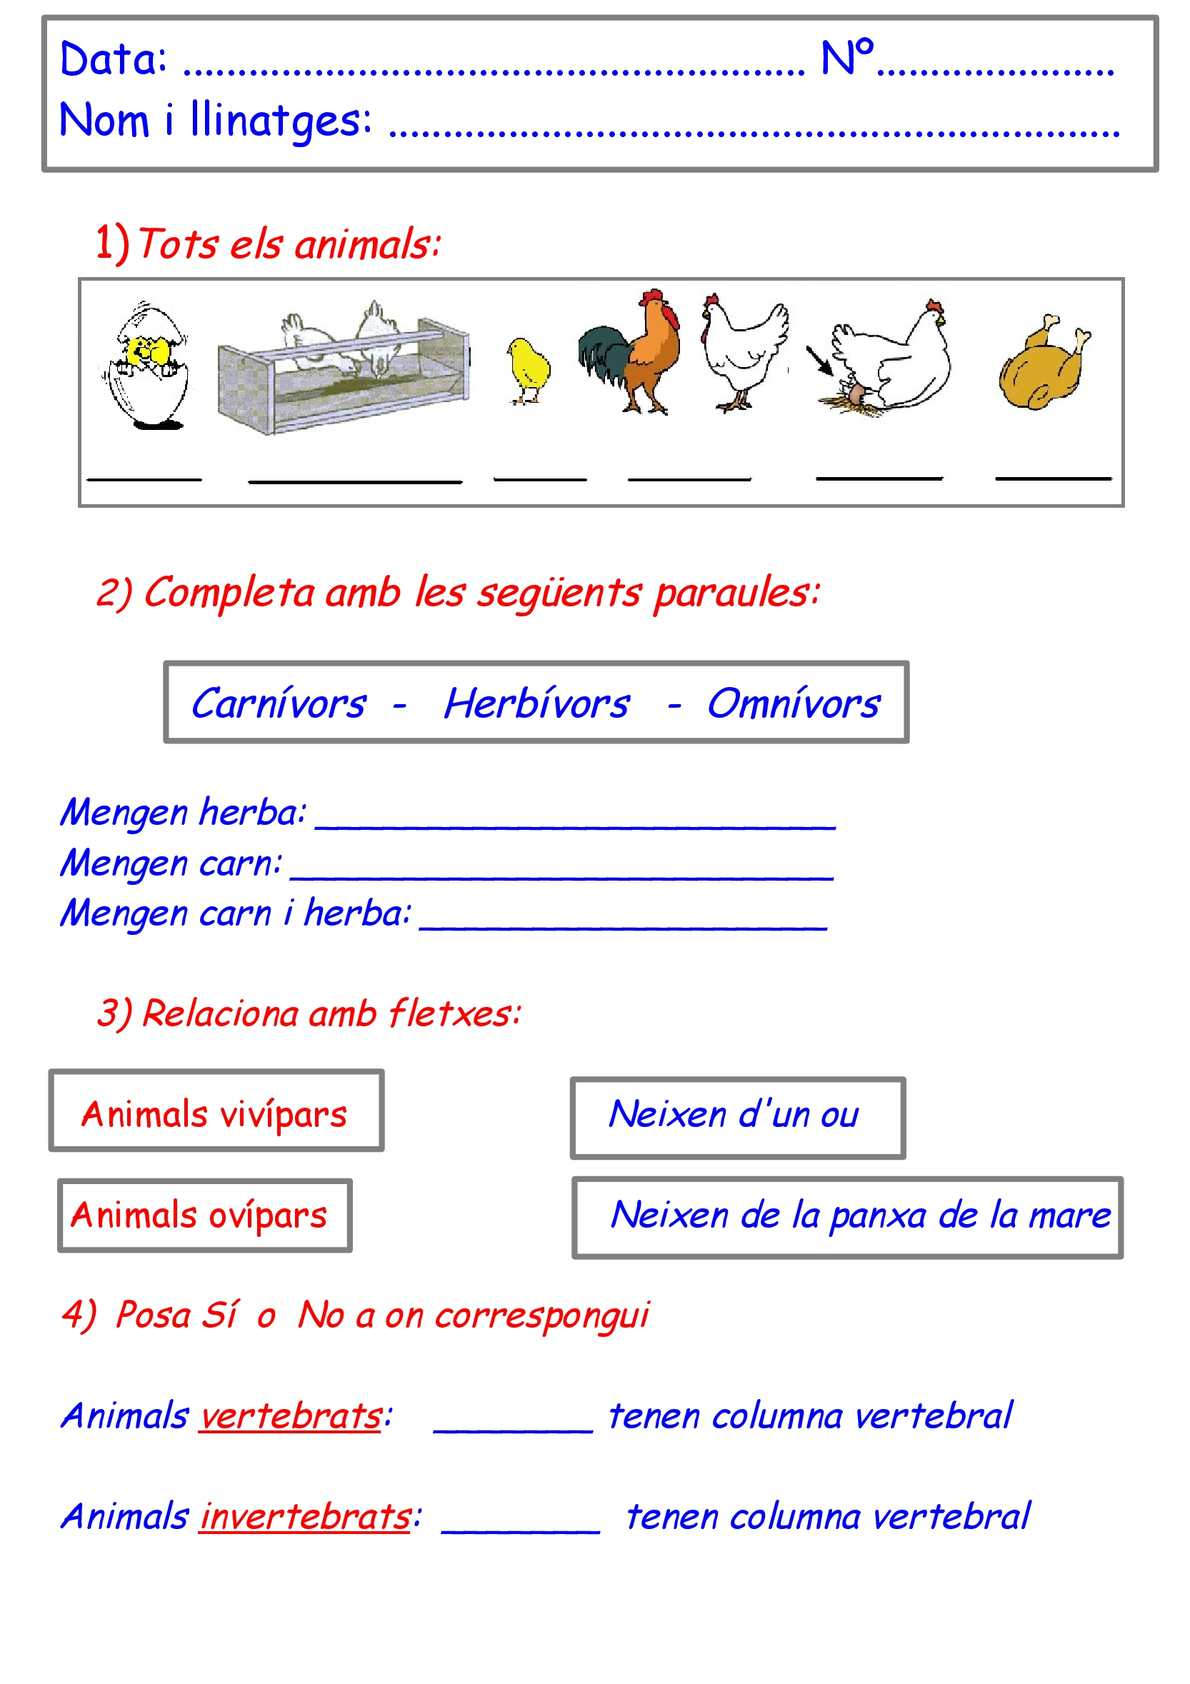 examen adaptat animals